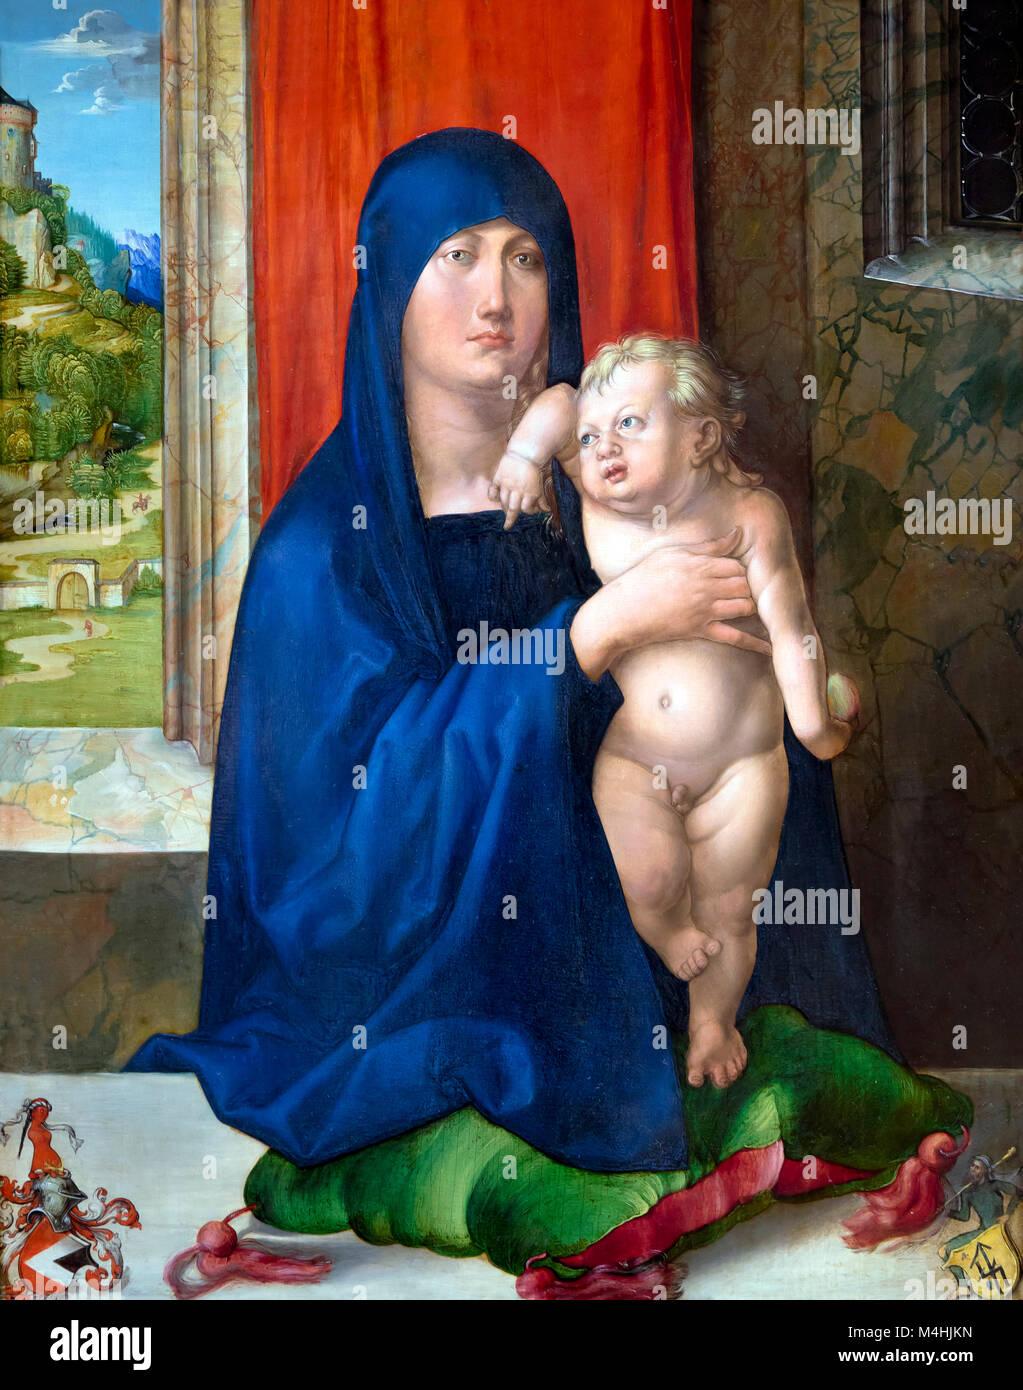 Madonna and Child, Albrecht Durer, circa 1496-1499, National Gallery of Art, Washington DC, USA, North America - Stock Image